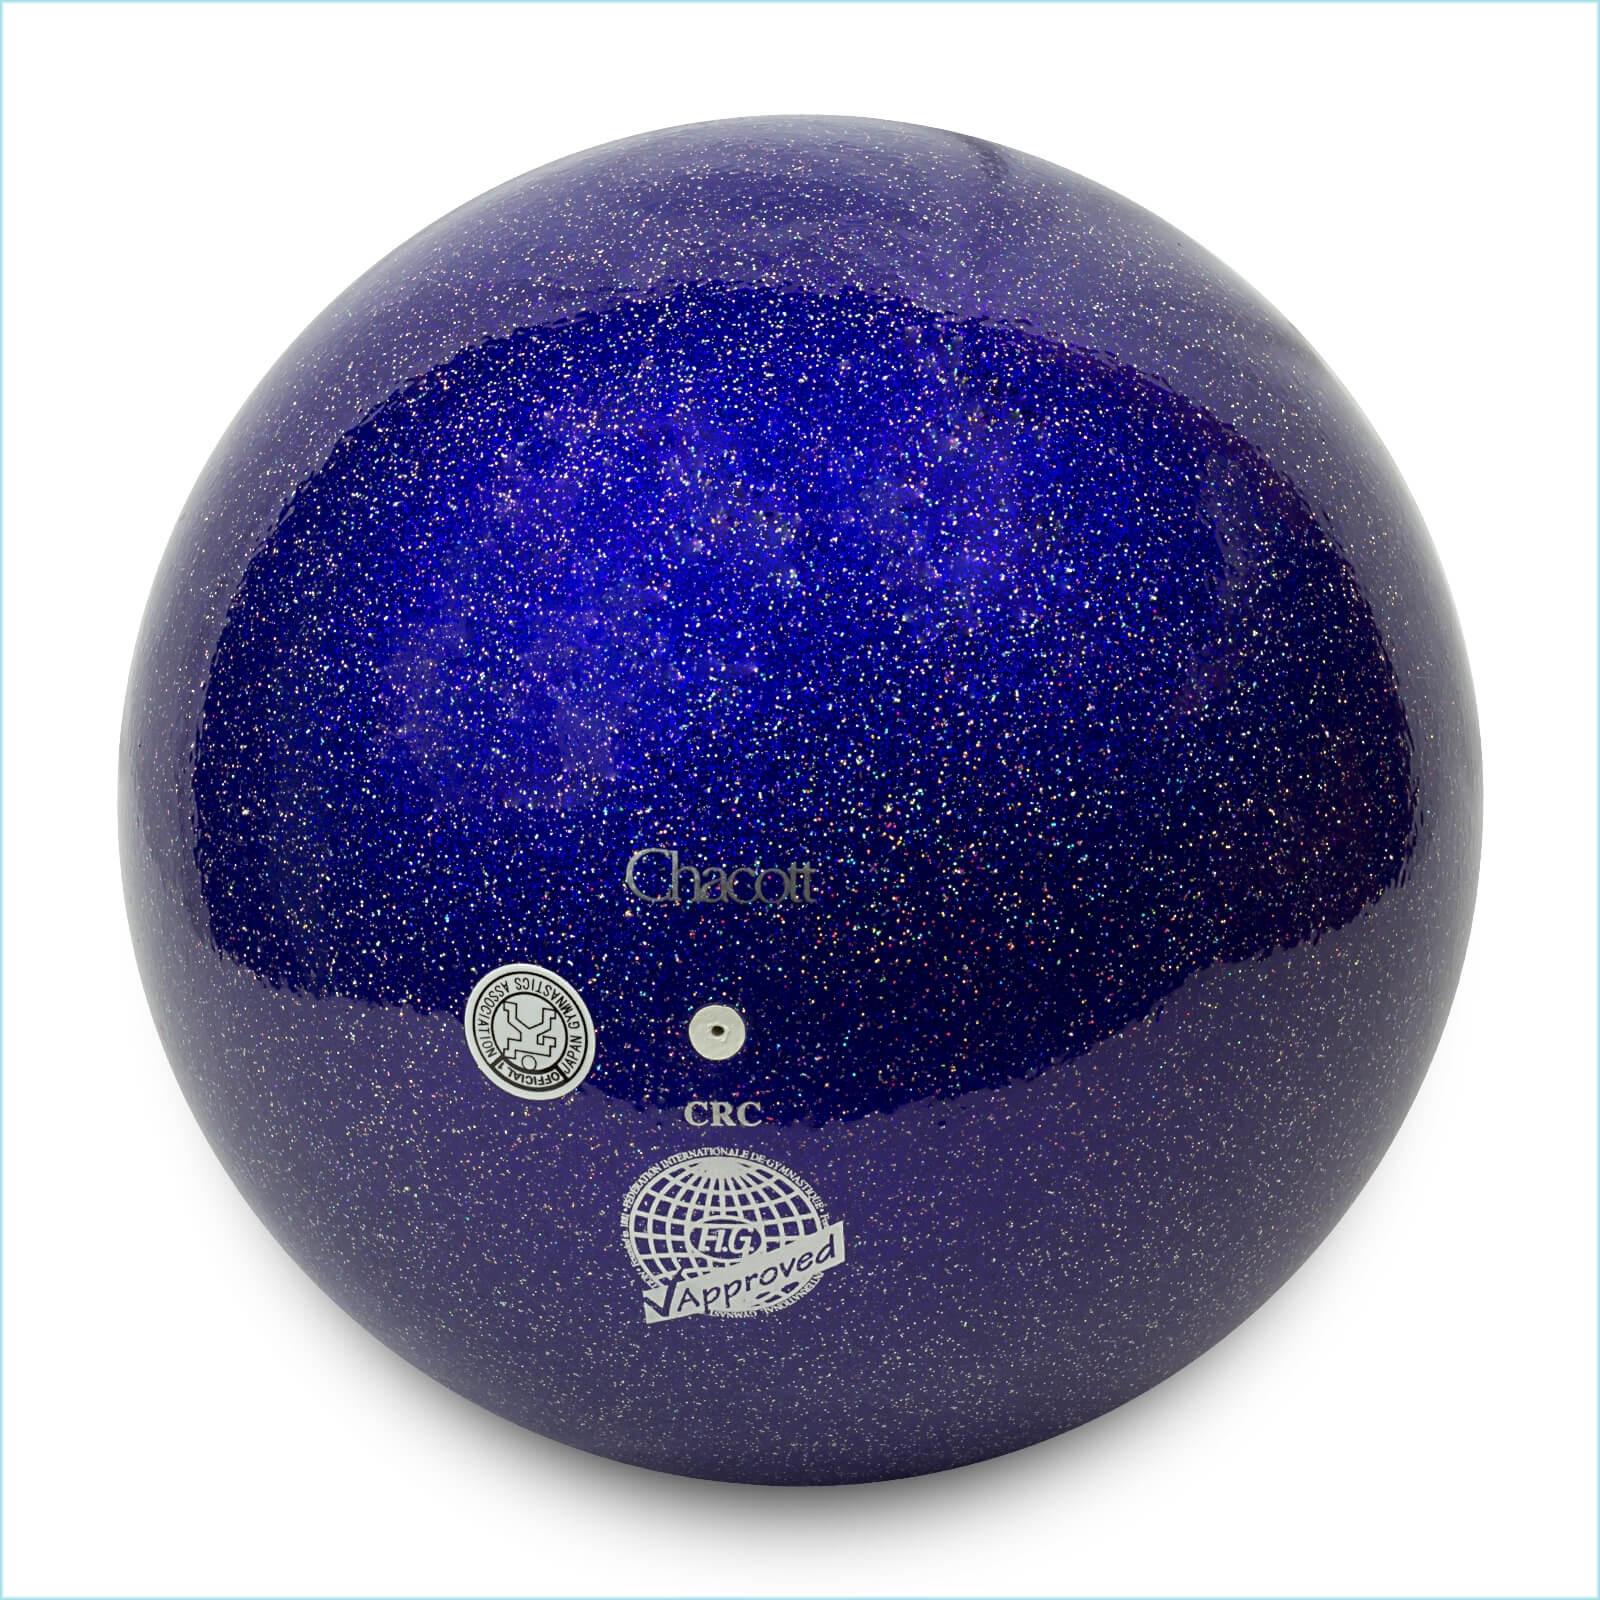 ball_chacott_jewelry_sapphire_528